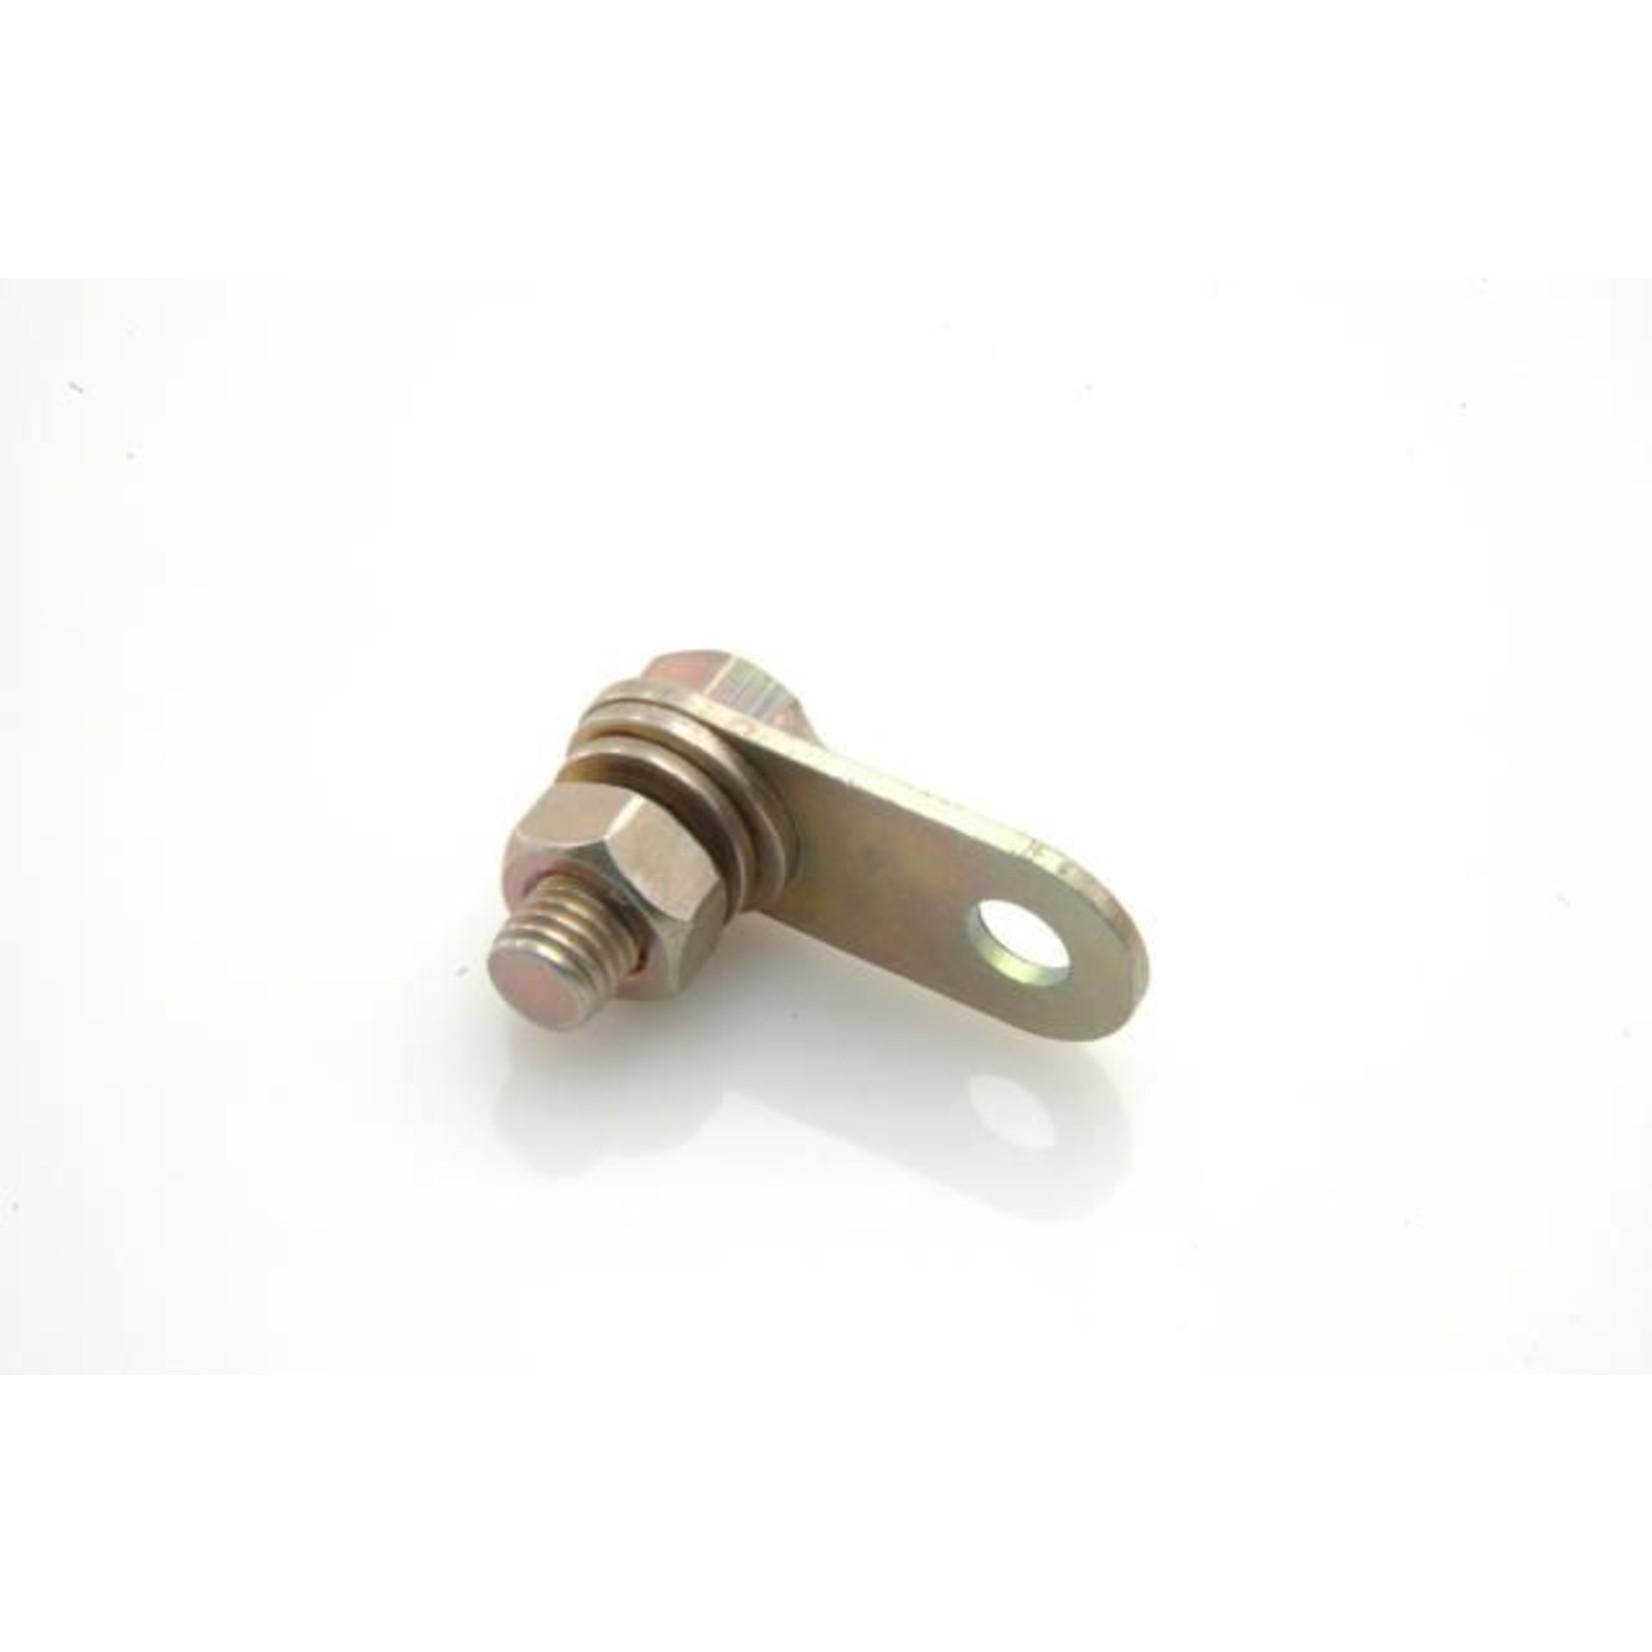 Plaquette serre cable 68- Nr Org: DX541108